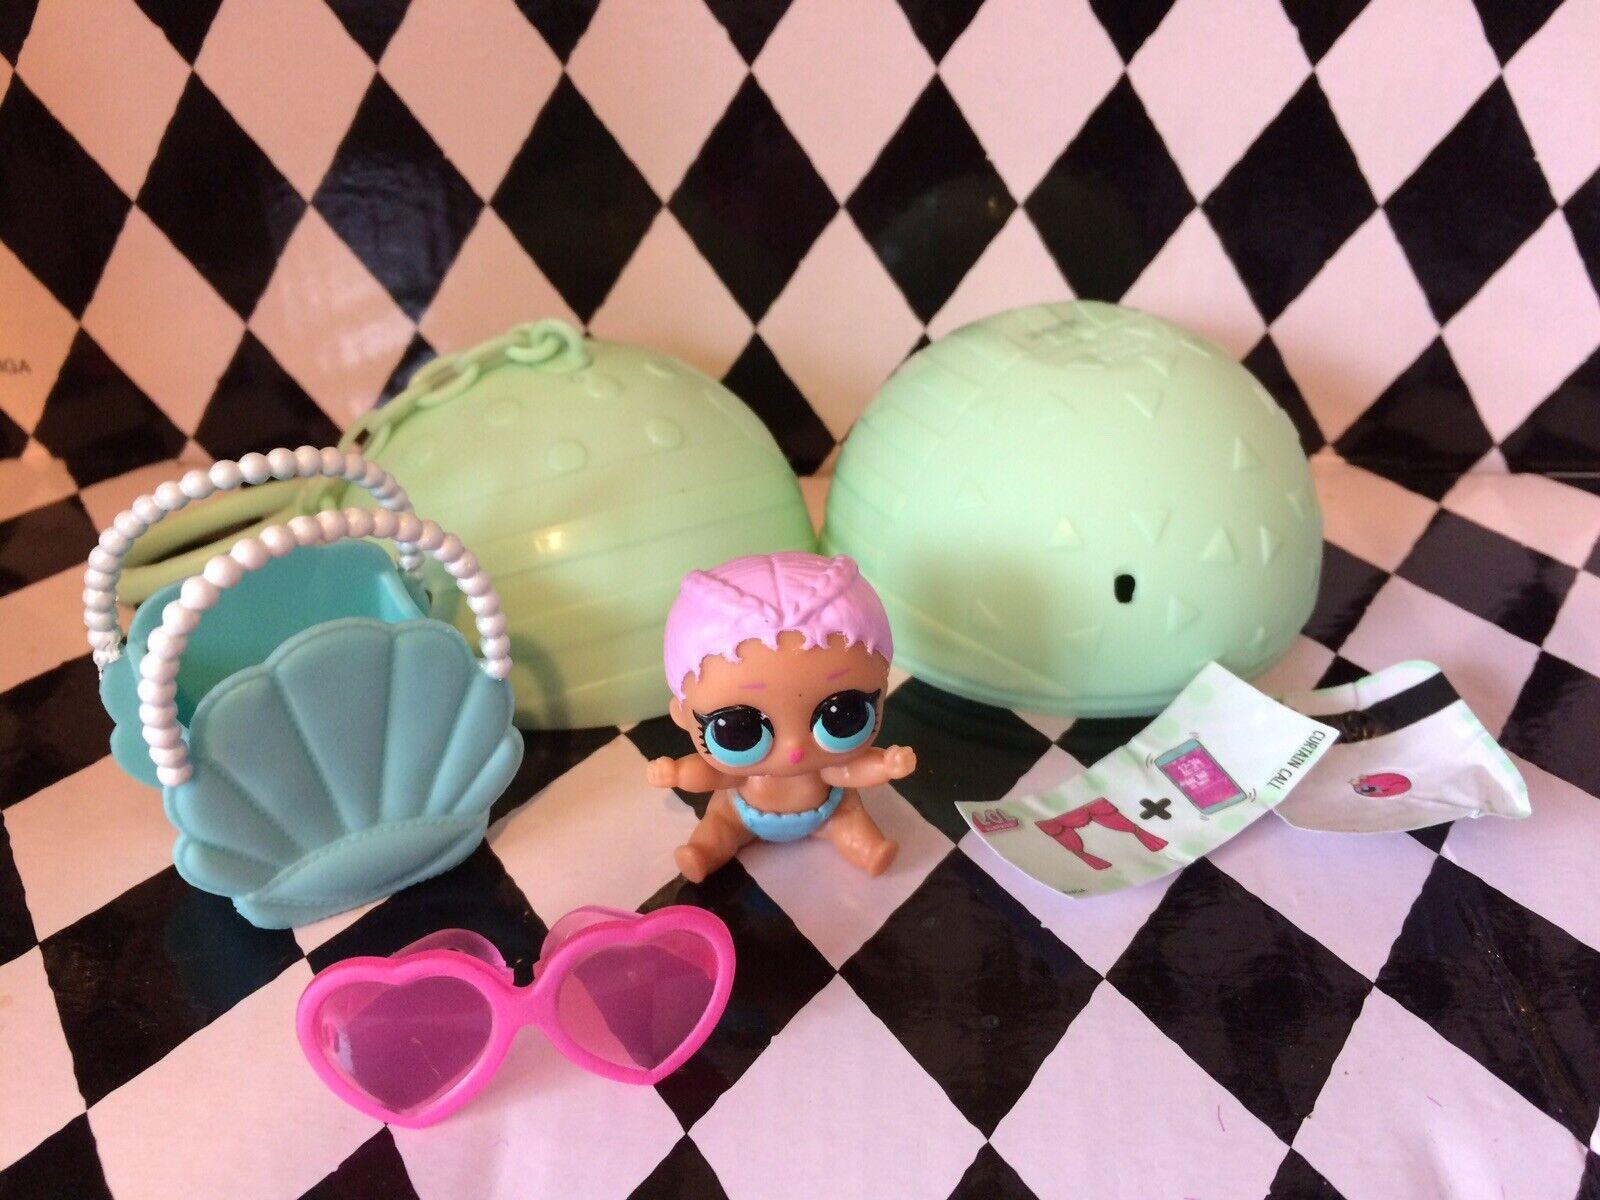 Lol Surprise Doll Series 2 - Lil Sister Merbaby, Complete